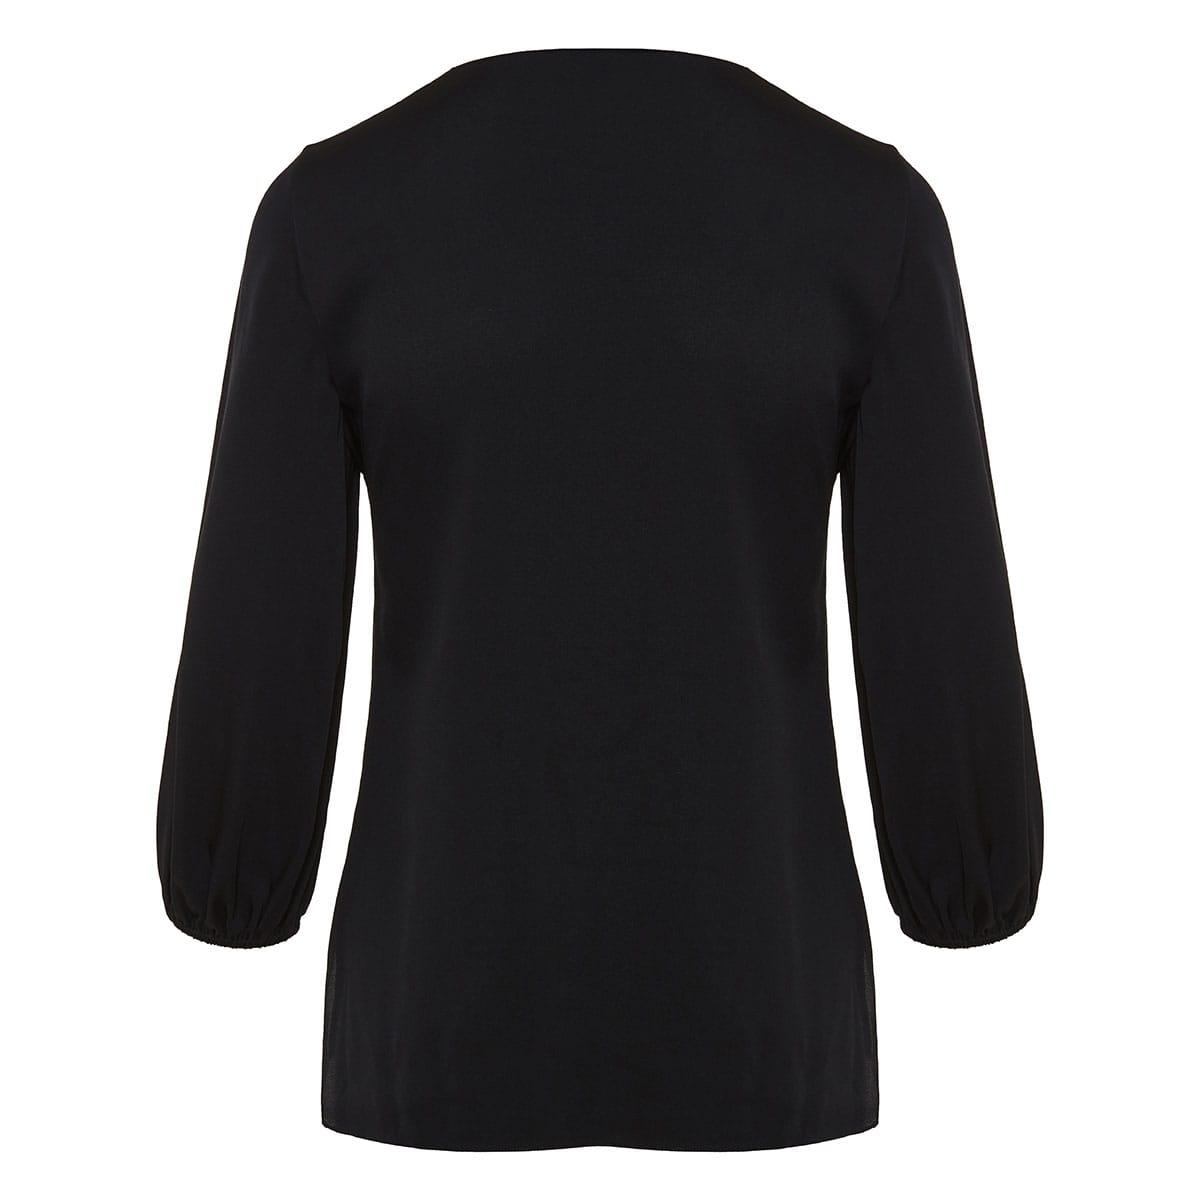 Puff-sleeved silk blouse